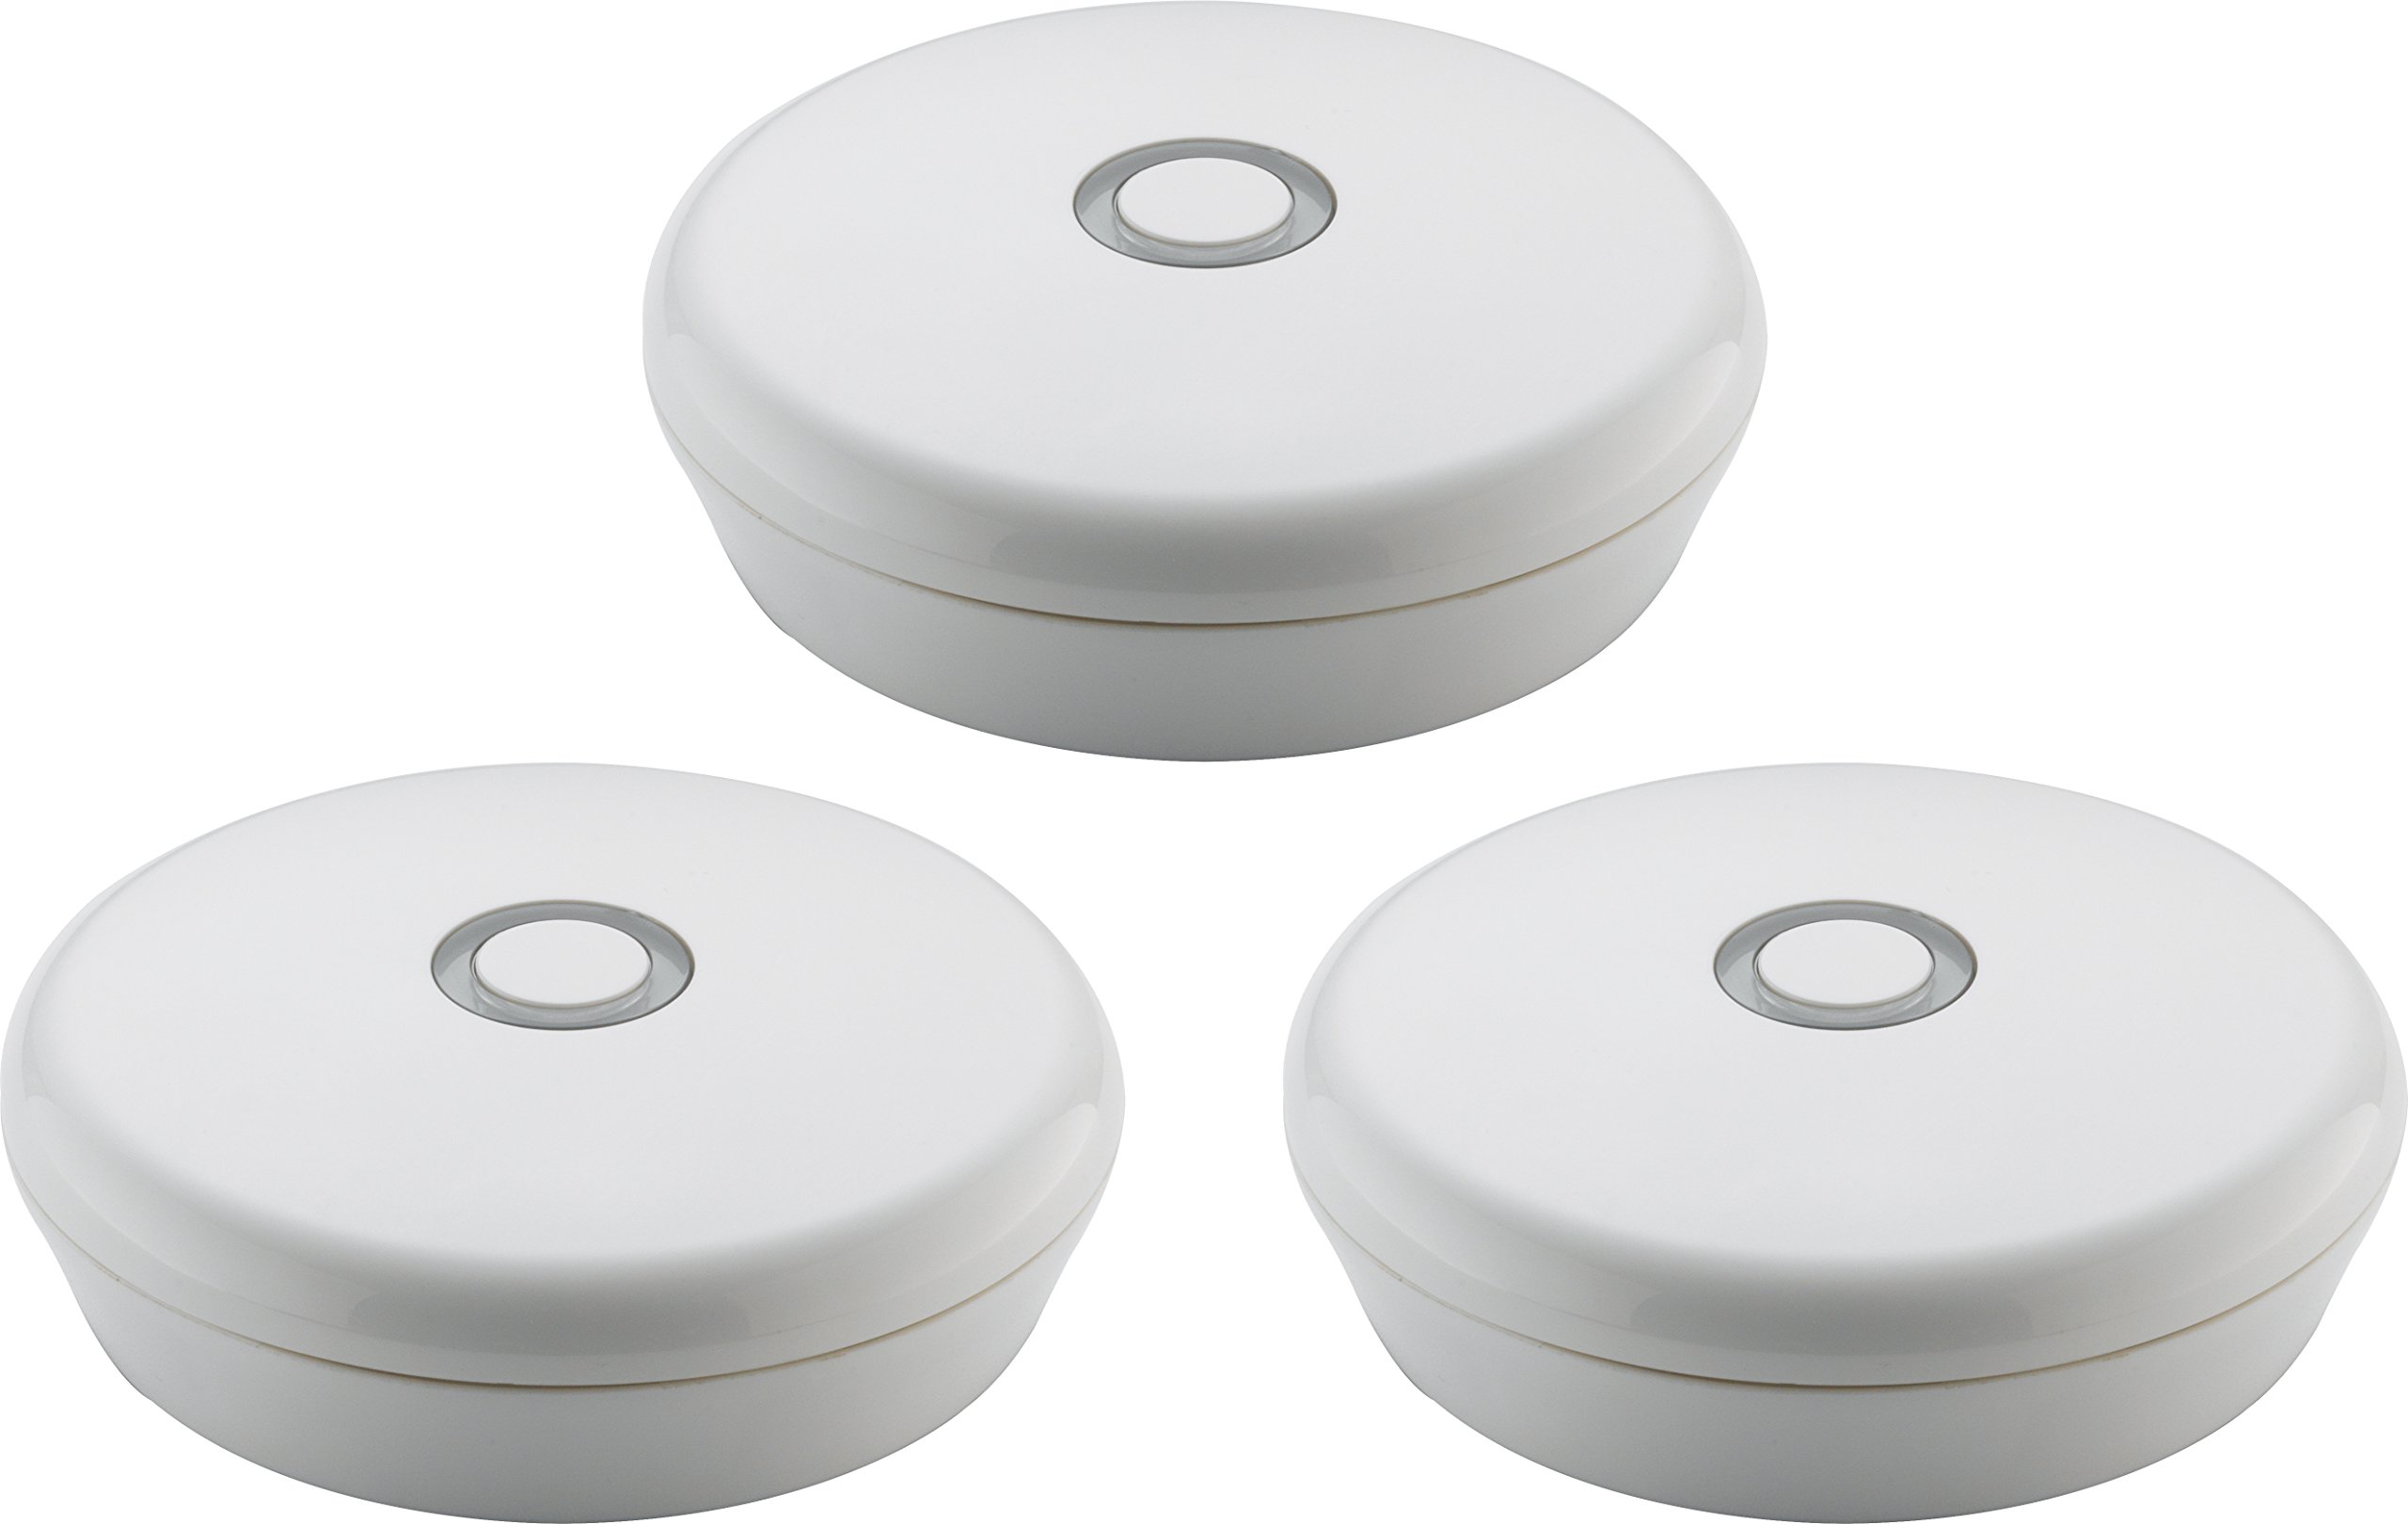 Delta Faucet LEAKX3 Leak Detect Wifi Water Detector, 3pk (No Hub Required)